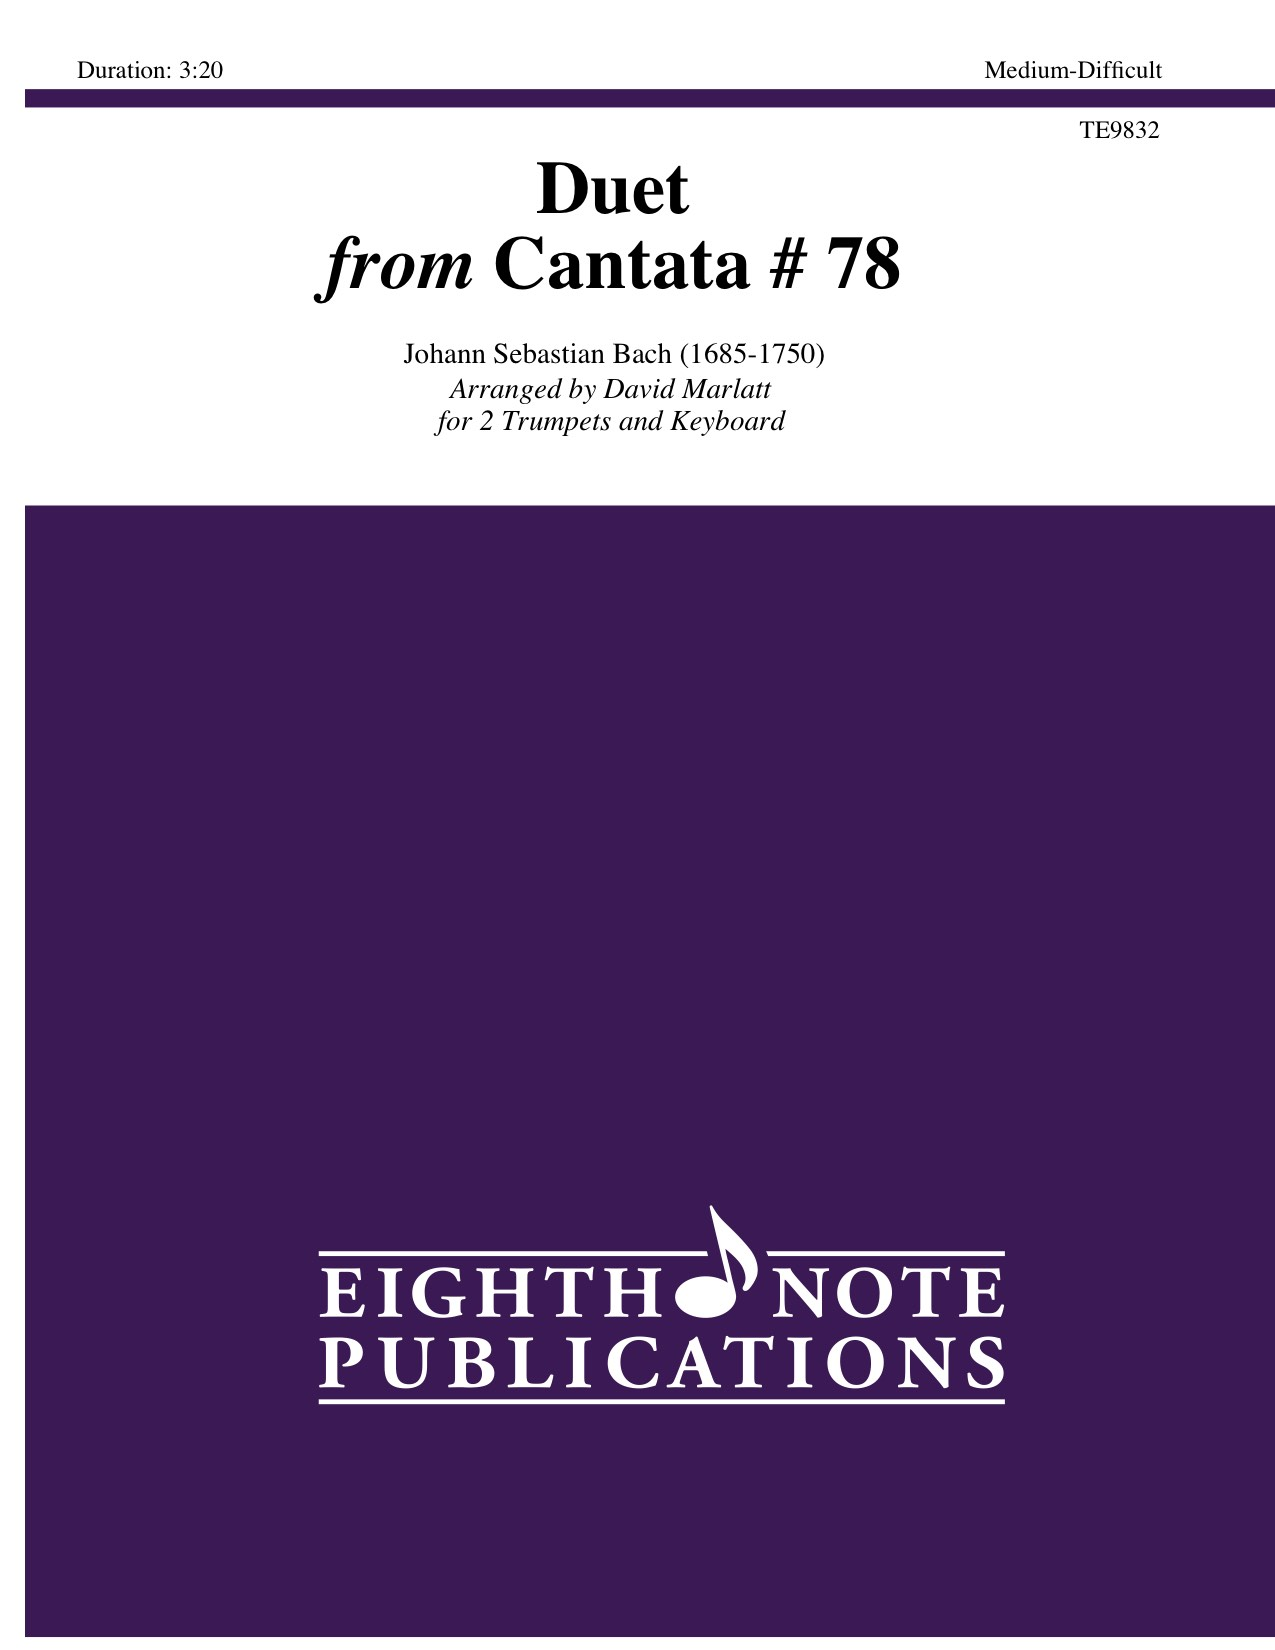 Duet from Cantata 78  - Johann Sebastian Bach